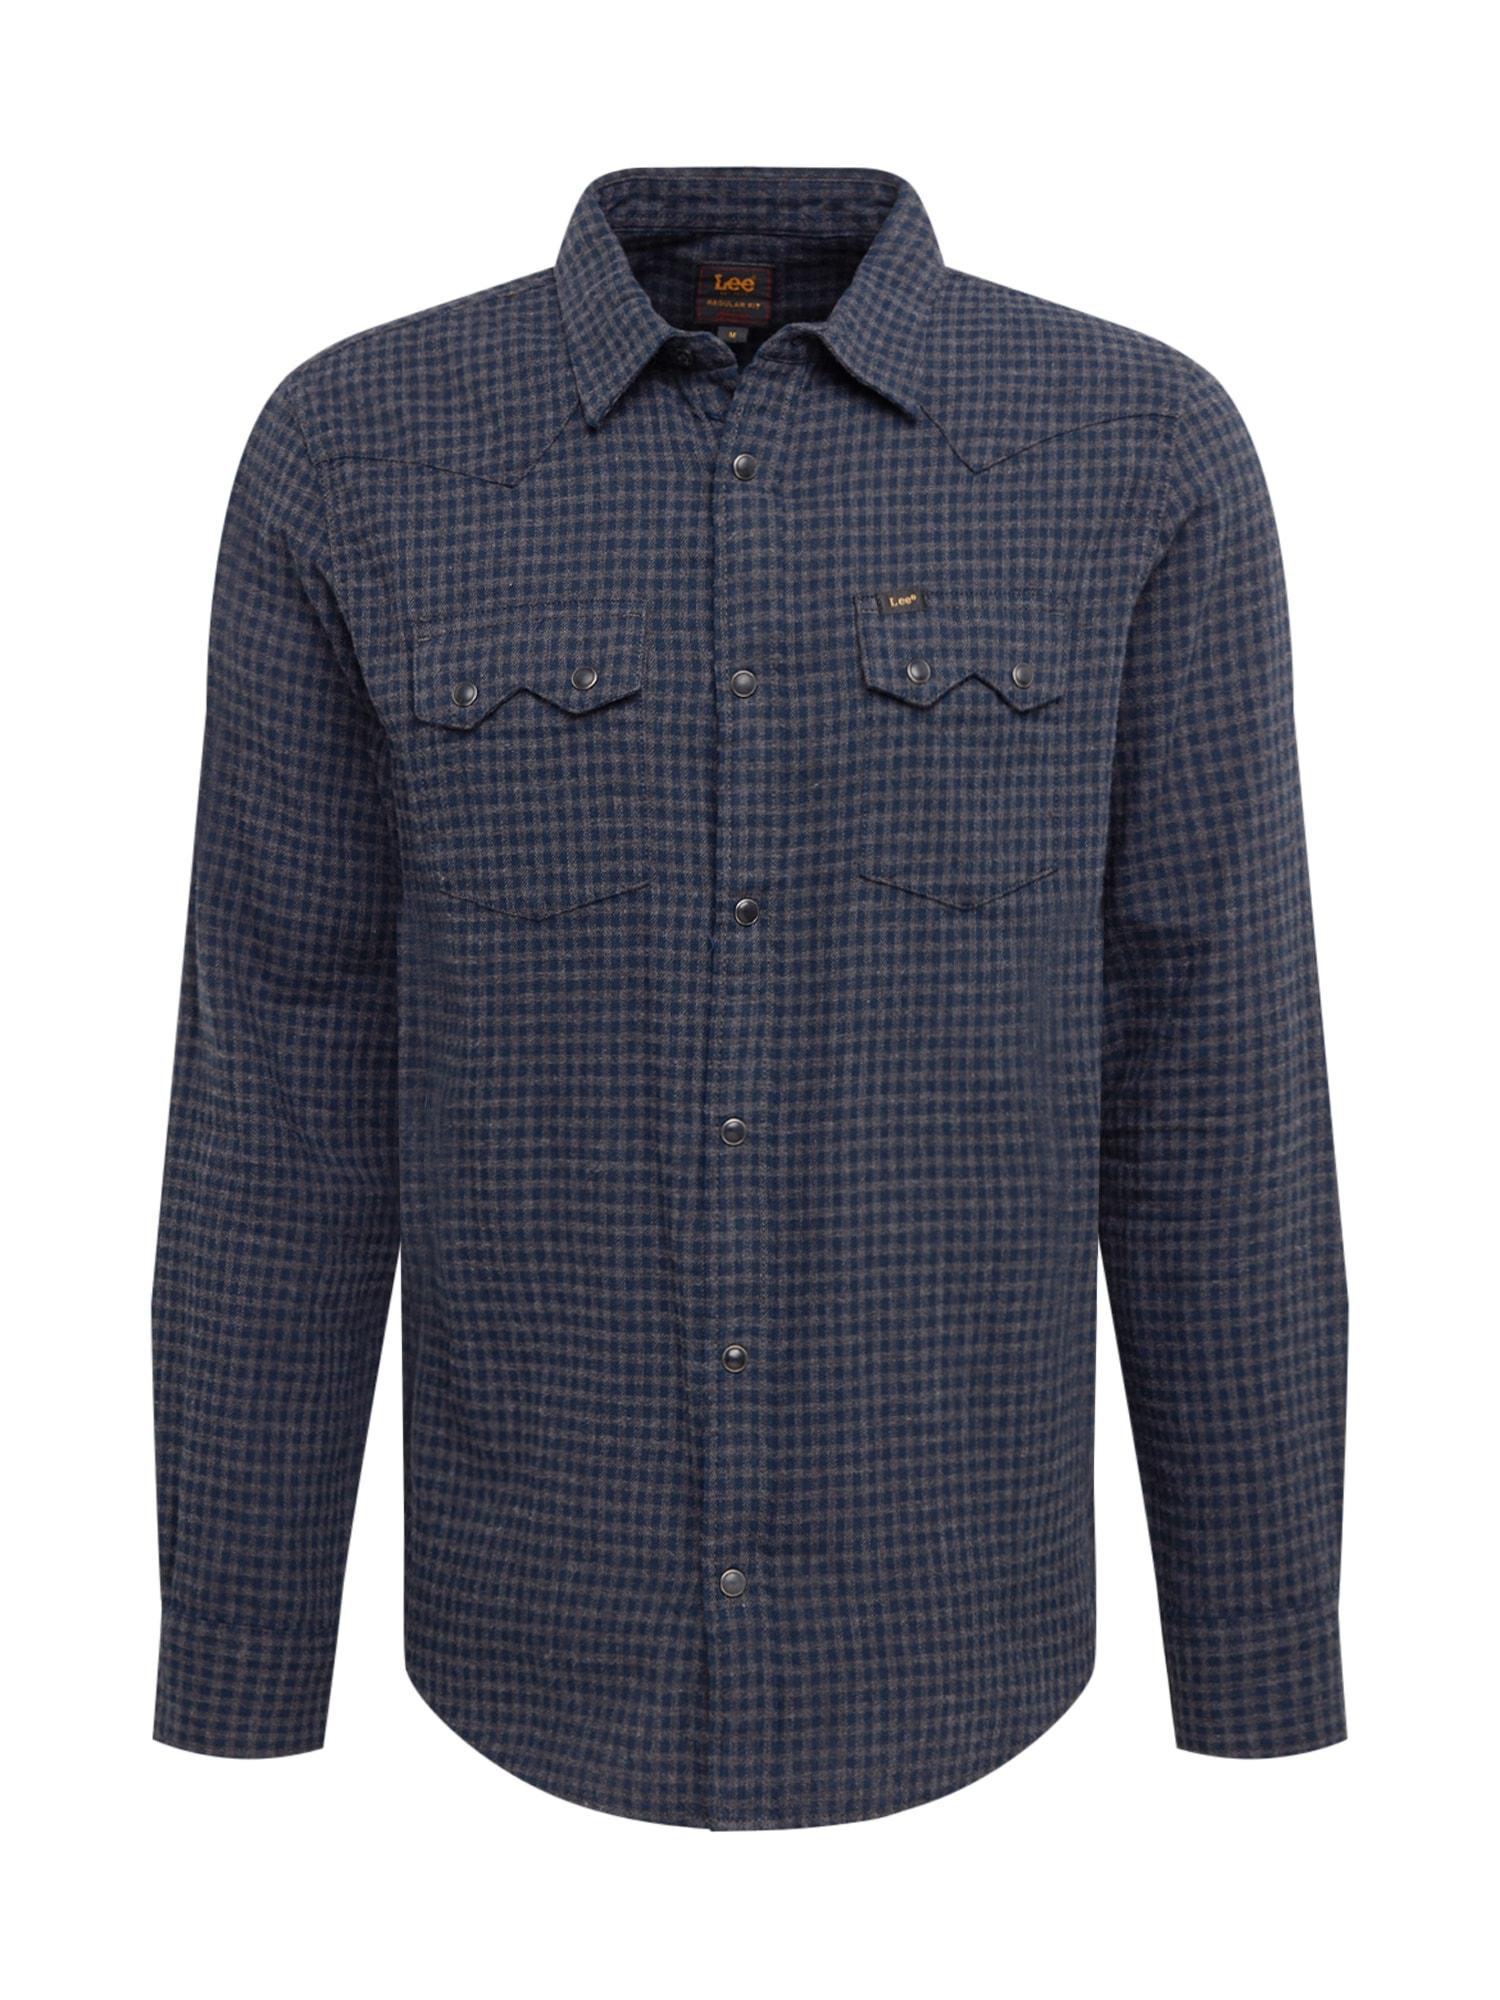 Lee Košile 'Rider'  tmavě šedá / modrá